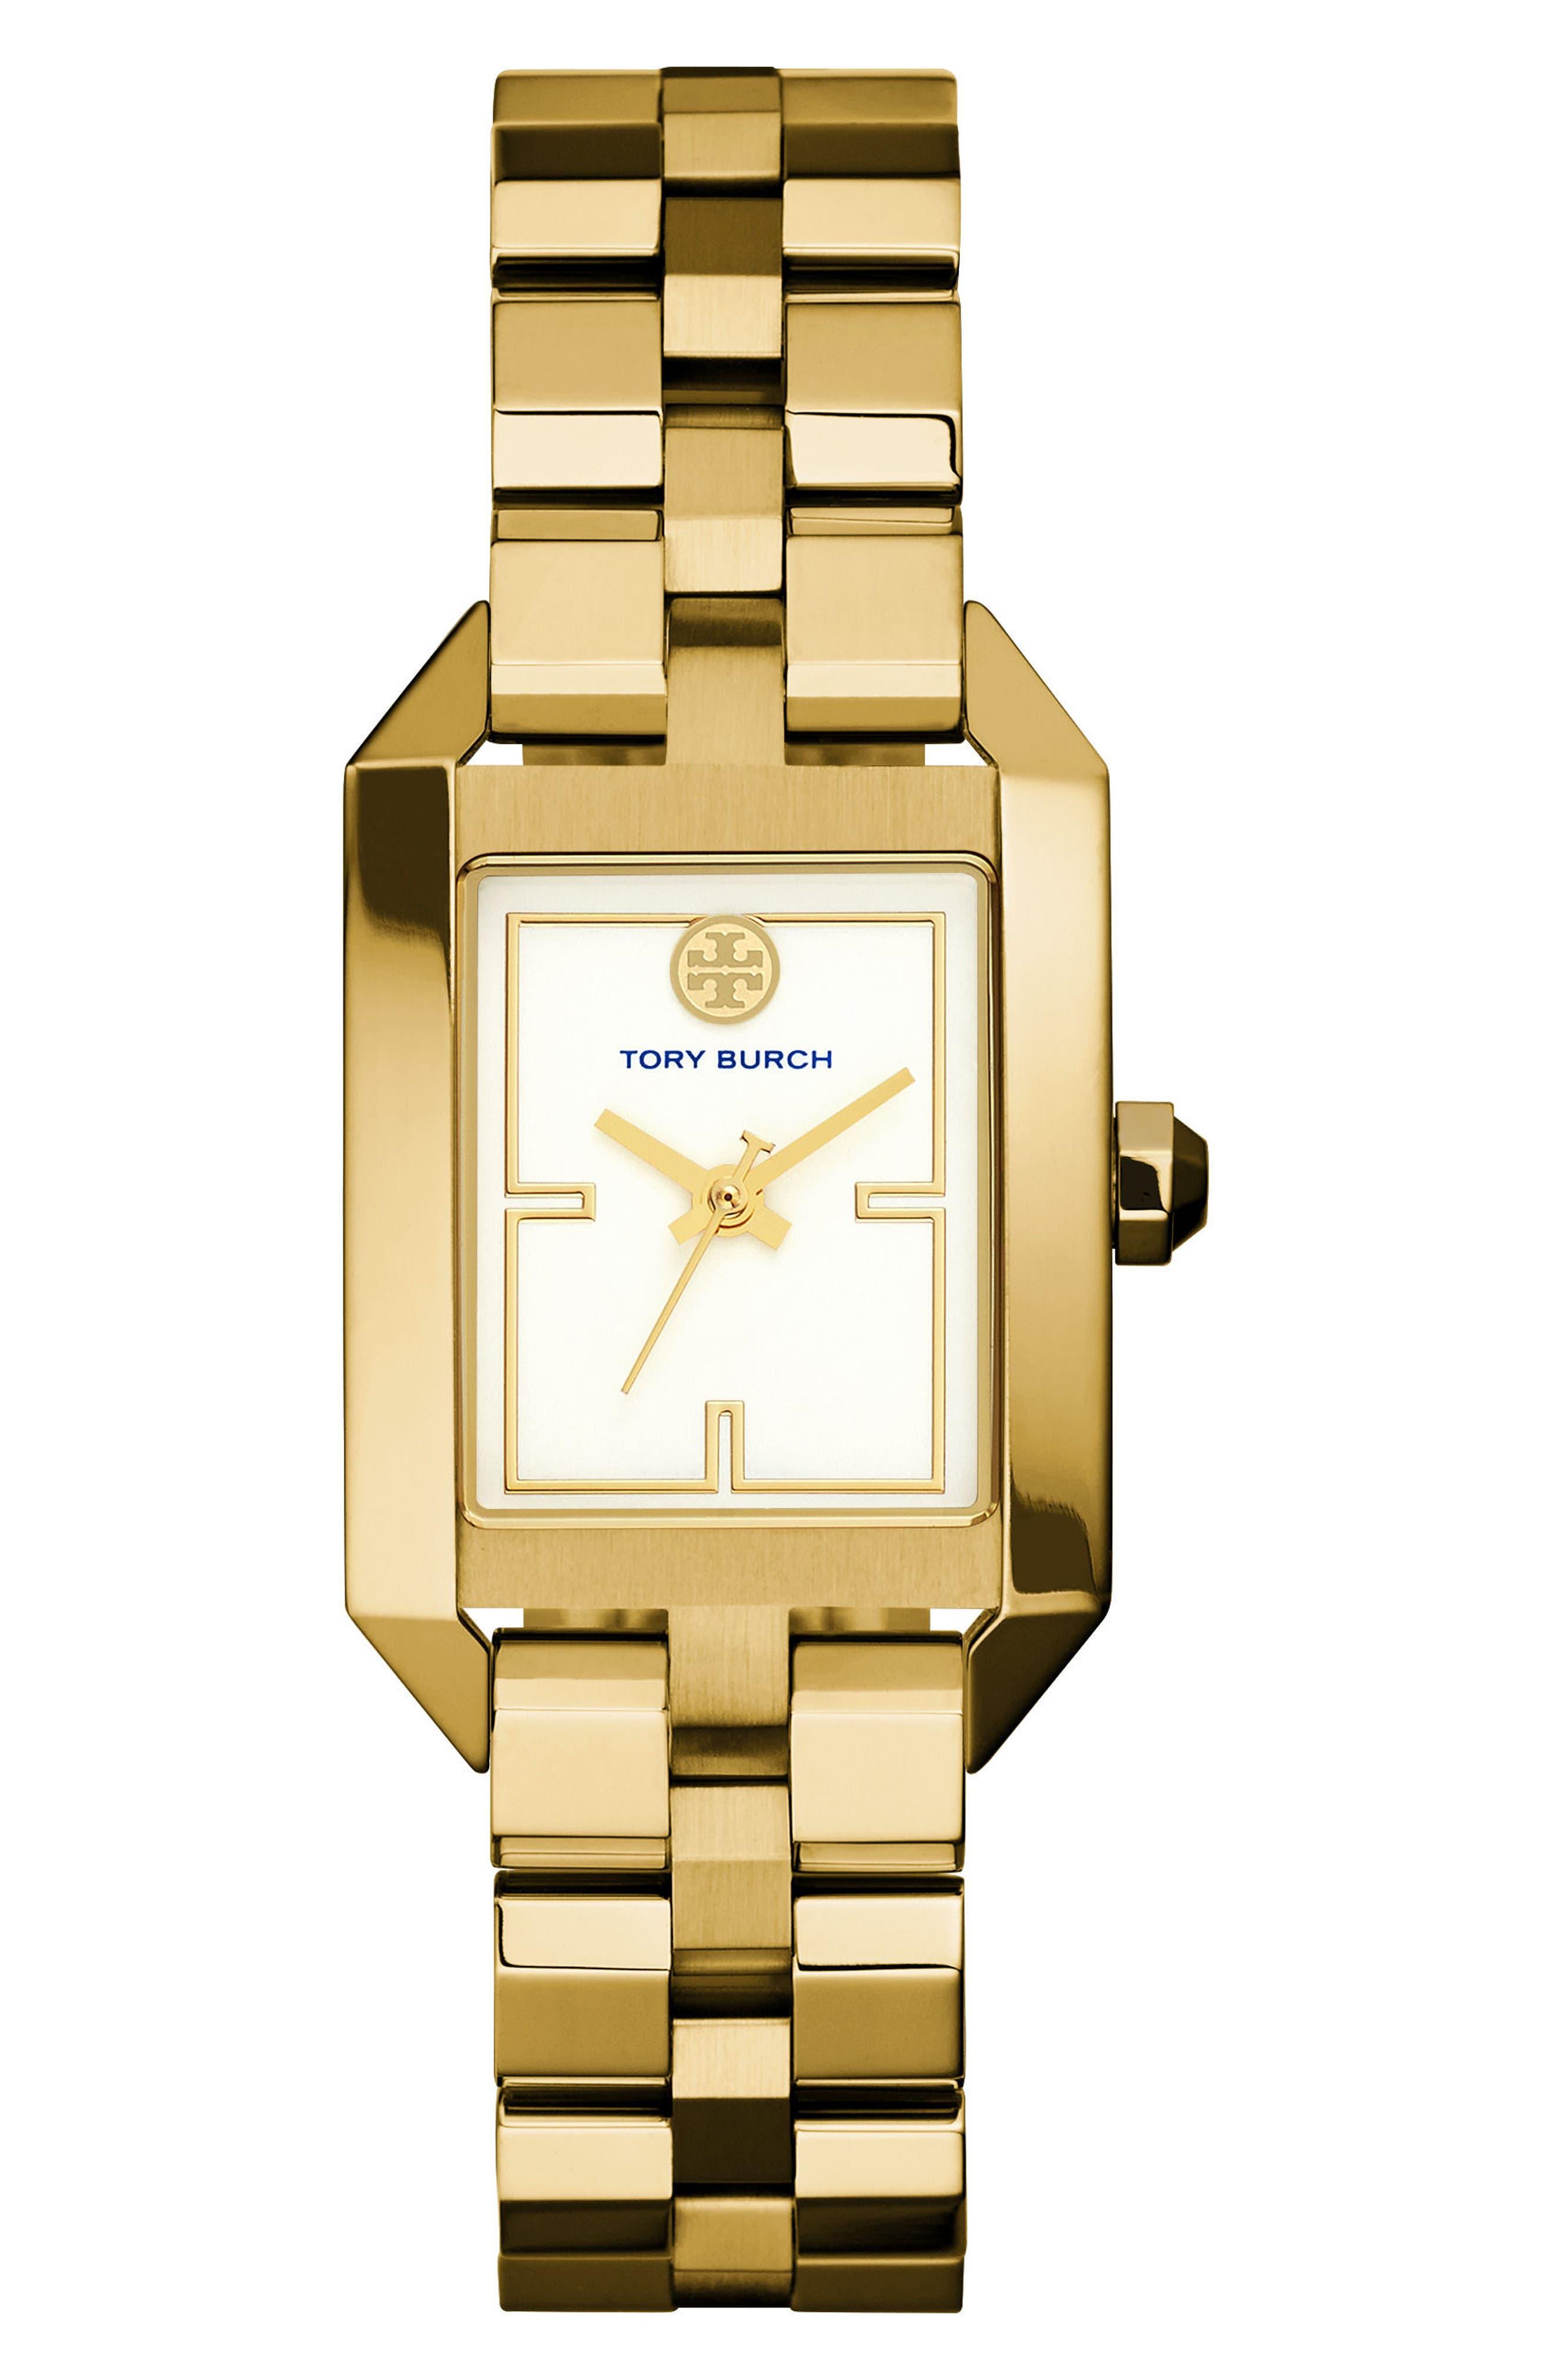 Tory Burch Dalloway Bracelet Watch, 23mm x 36.5mm